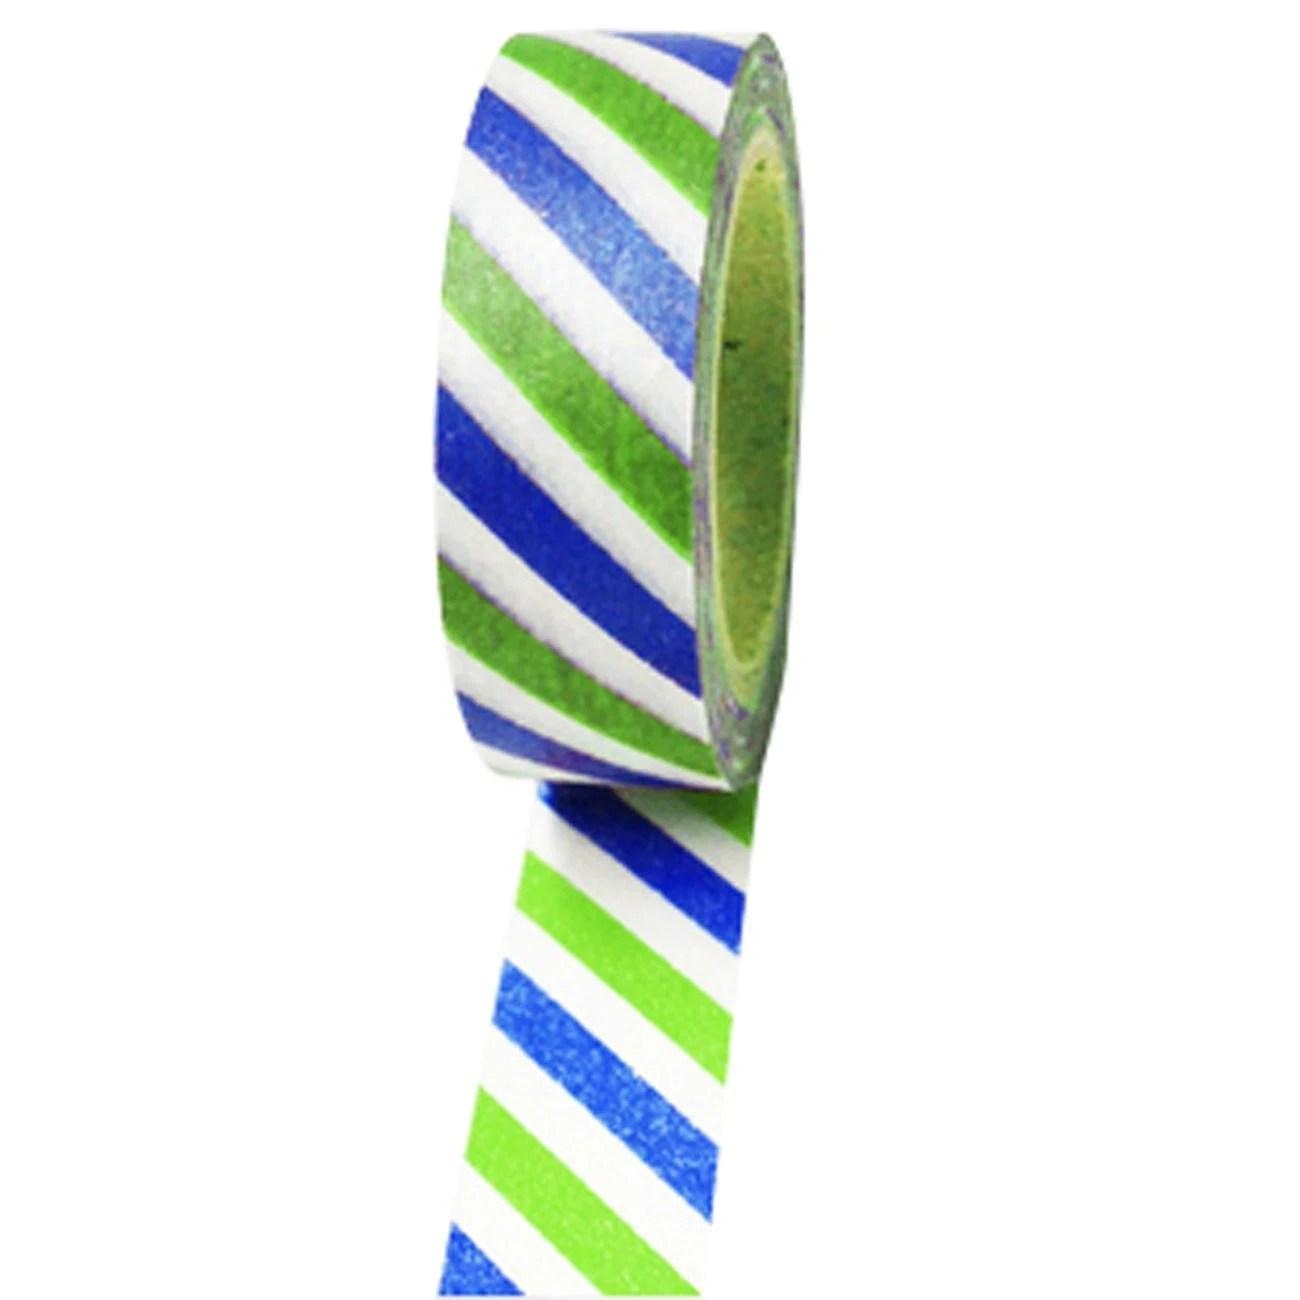 Blue and Green Diagonal Stripes Washi Paper Masking Tape, 11 yds/10 Meters, Craft Tape, Scrapbook Embellishment, Geometric, Gift Wrap - CMWrapNShipSupply